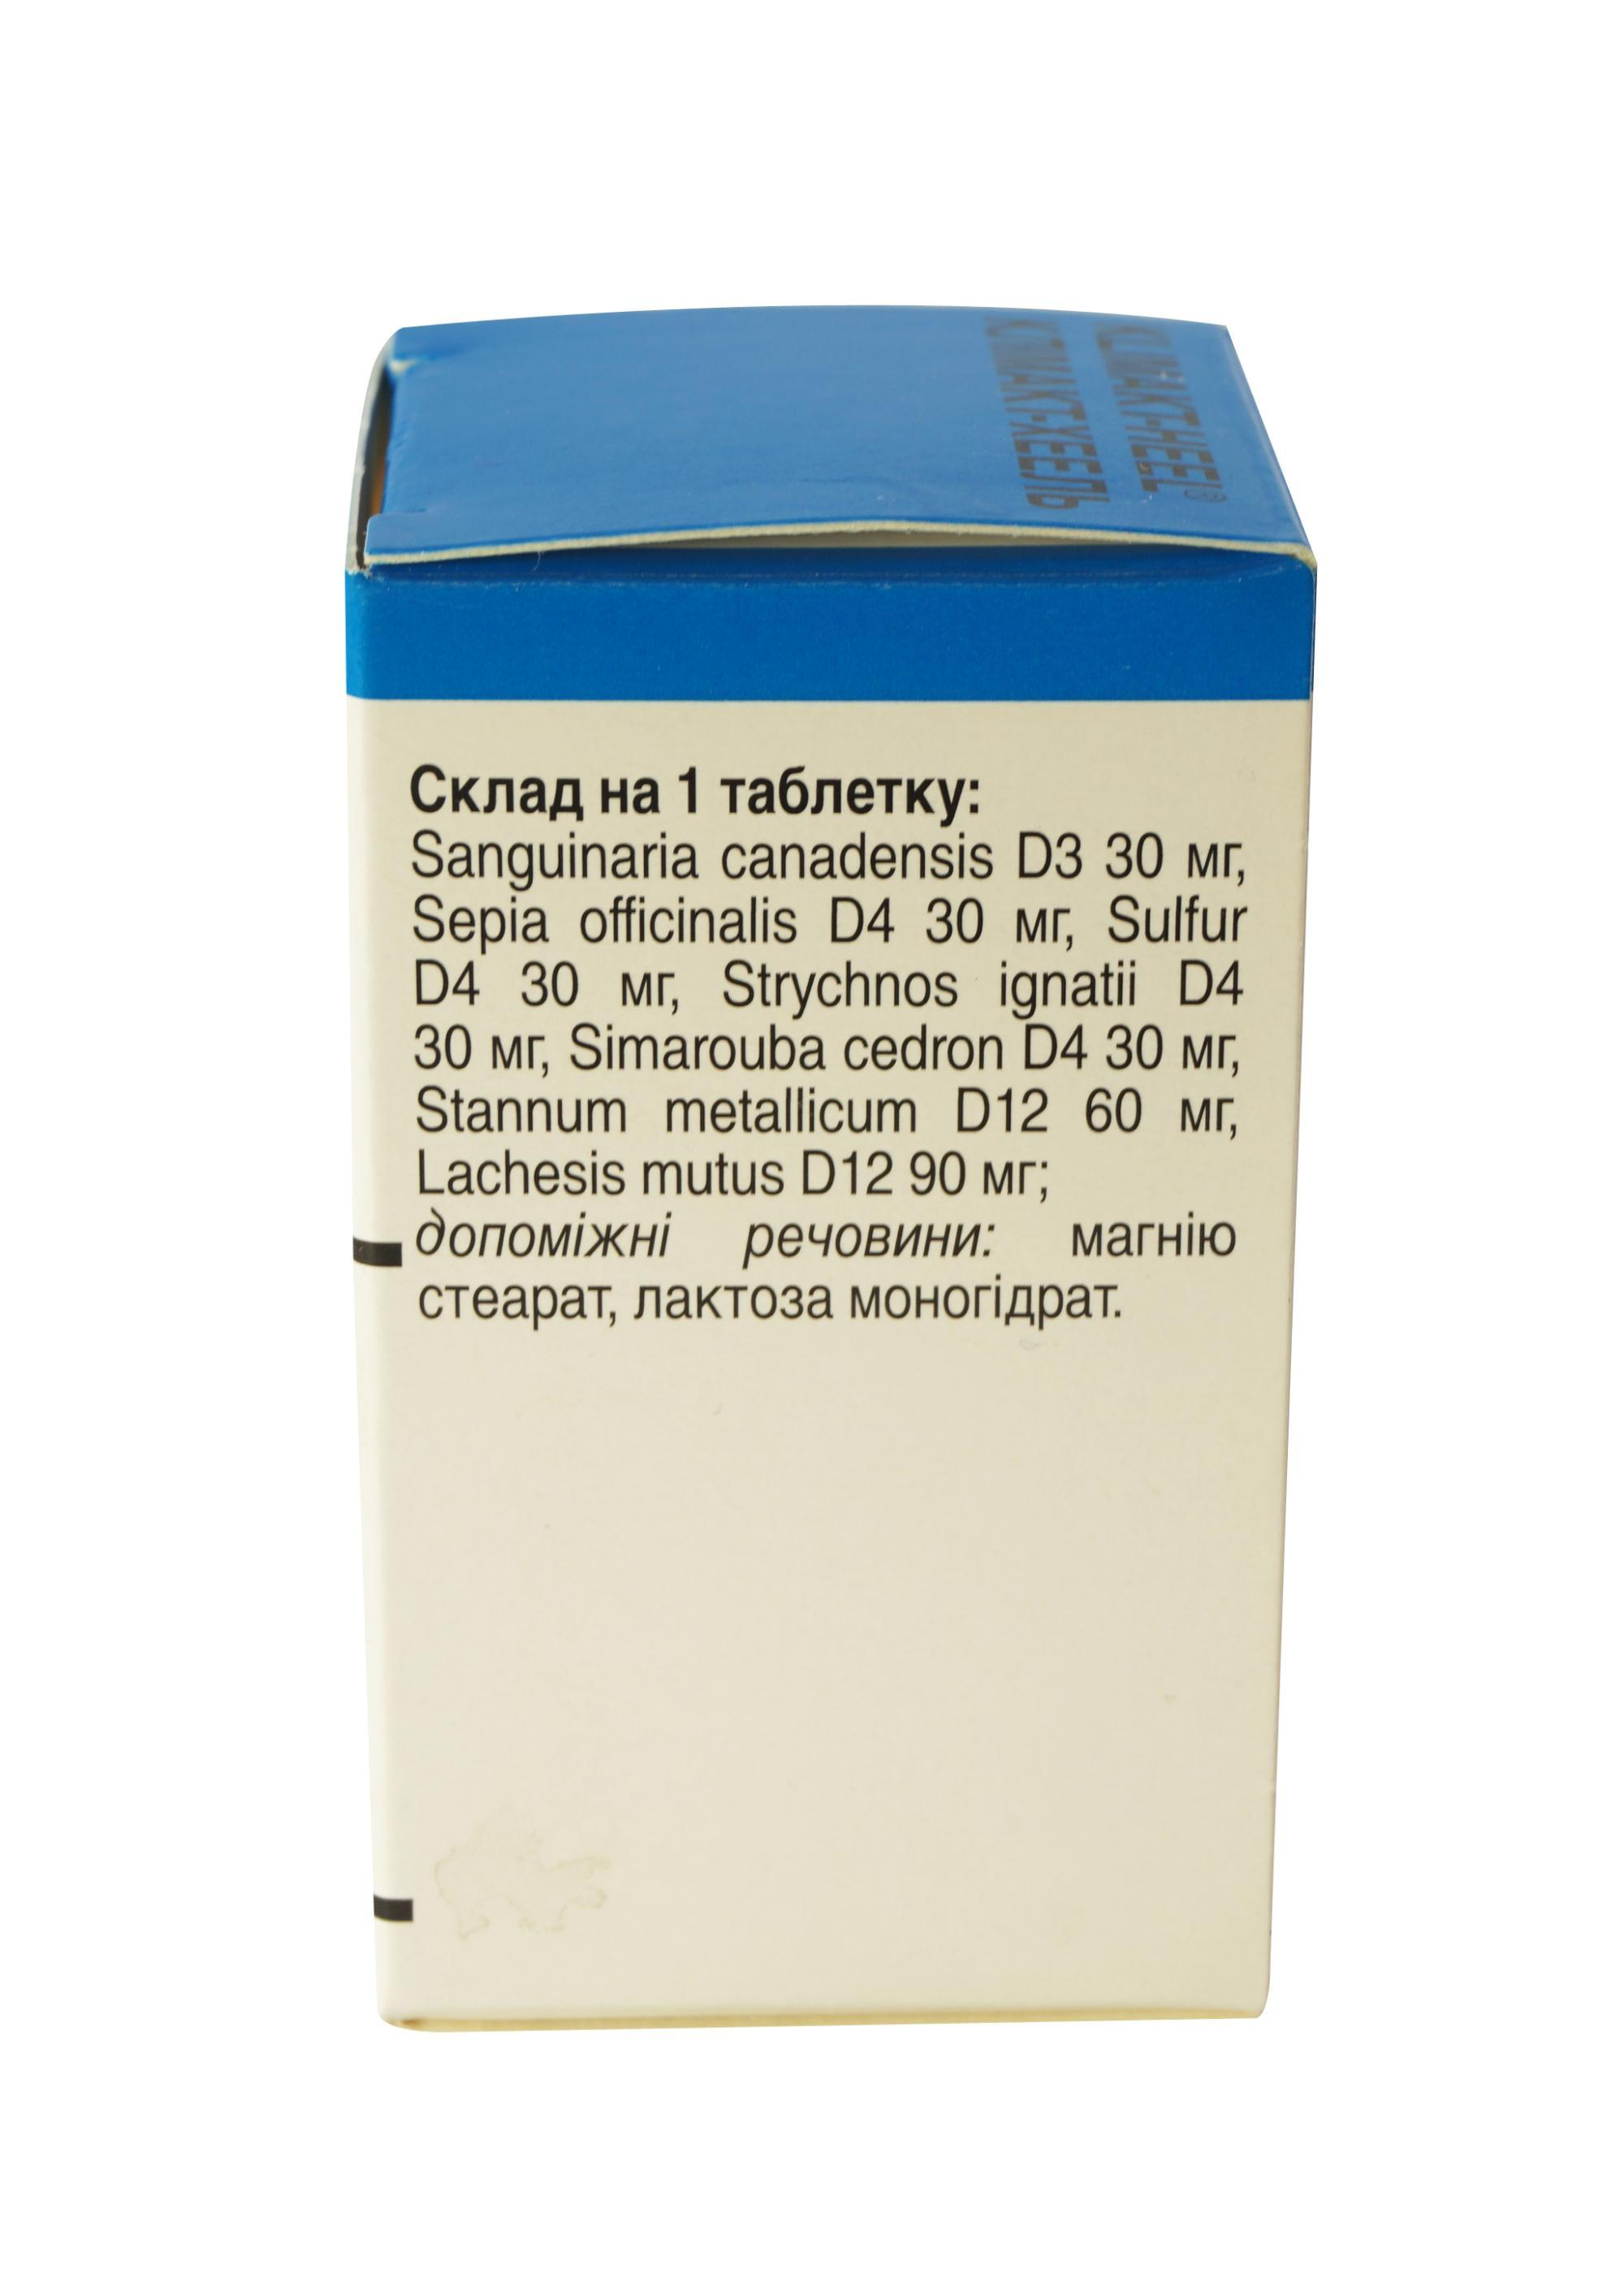 Применение при климаксе гомеопатического препарата климакт хель